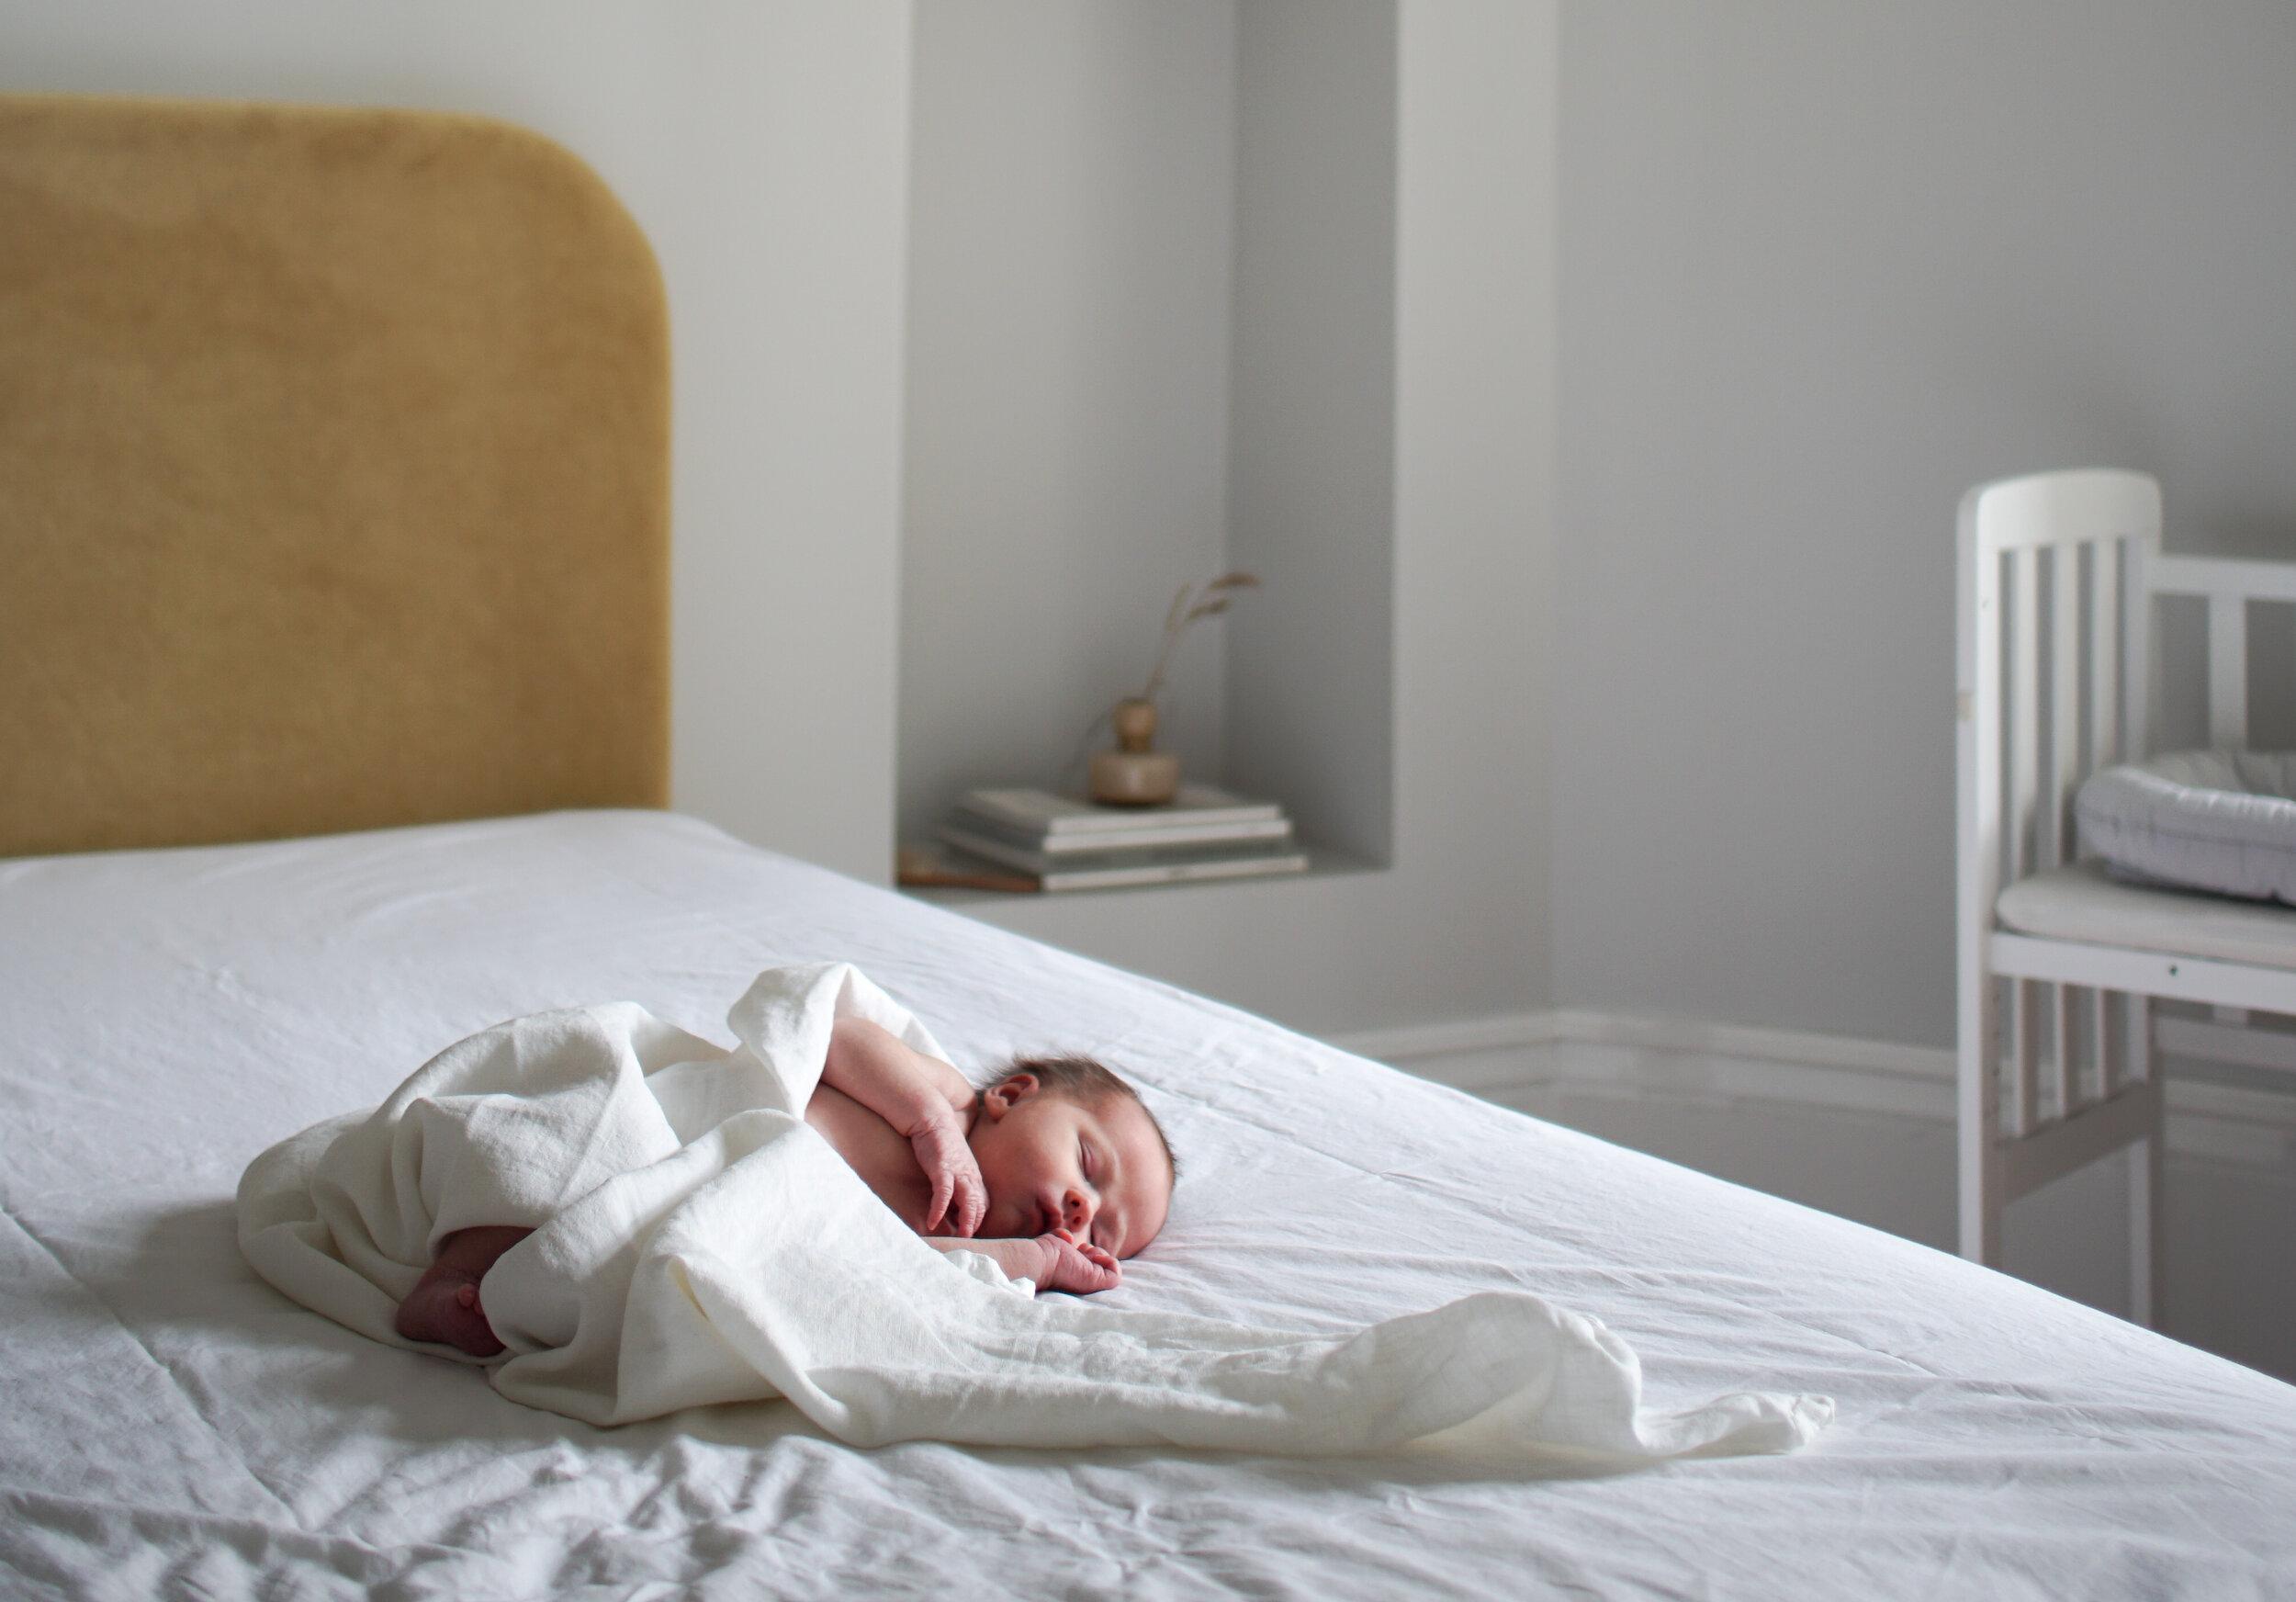 20190921-Coterie-Baby-6days-01502-2.jpg